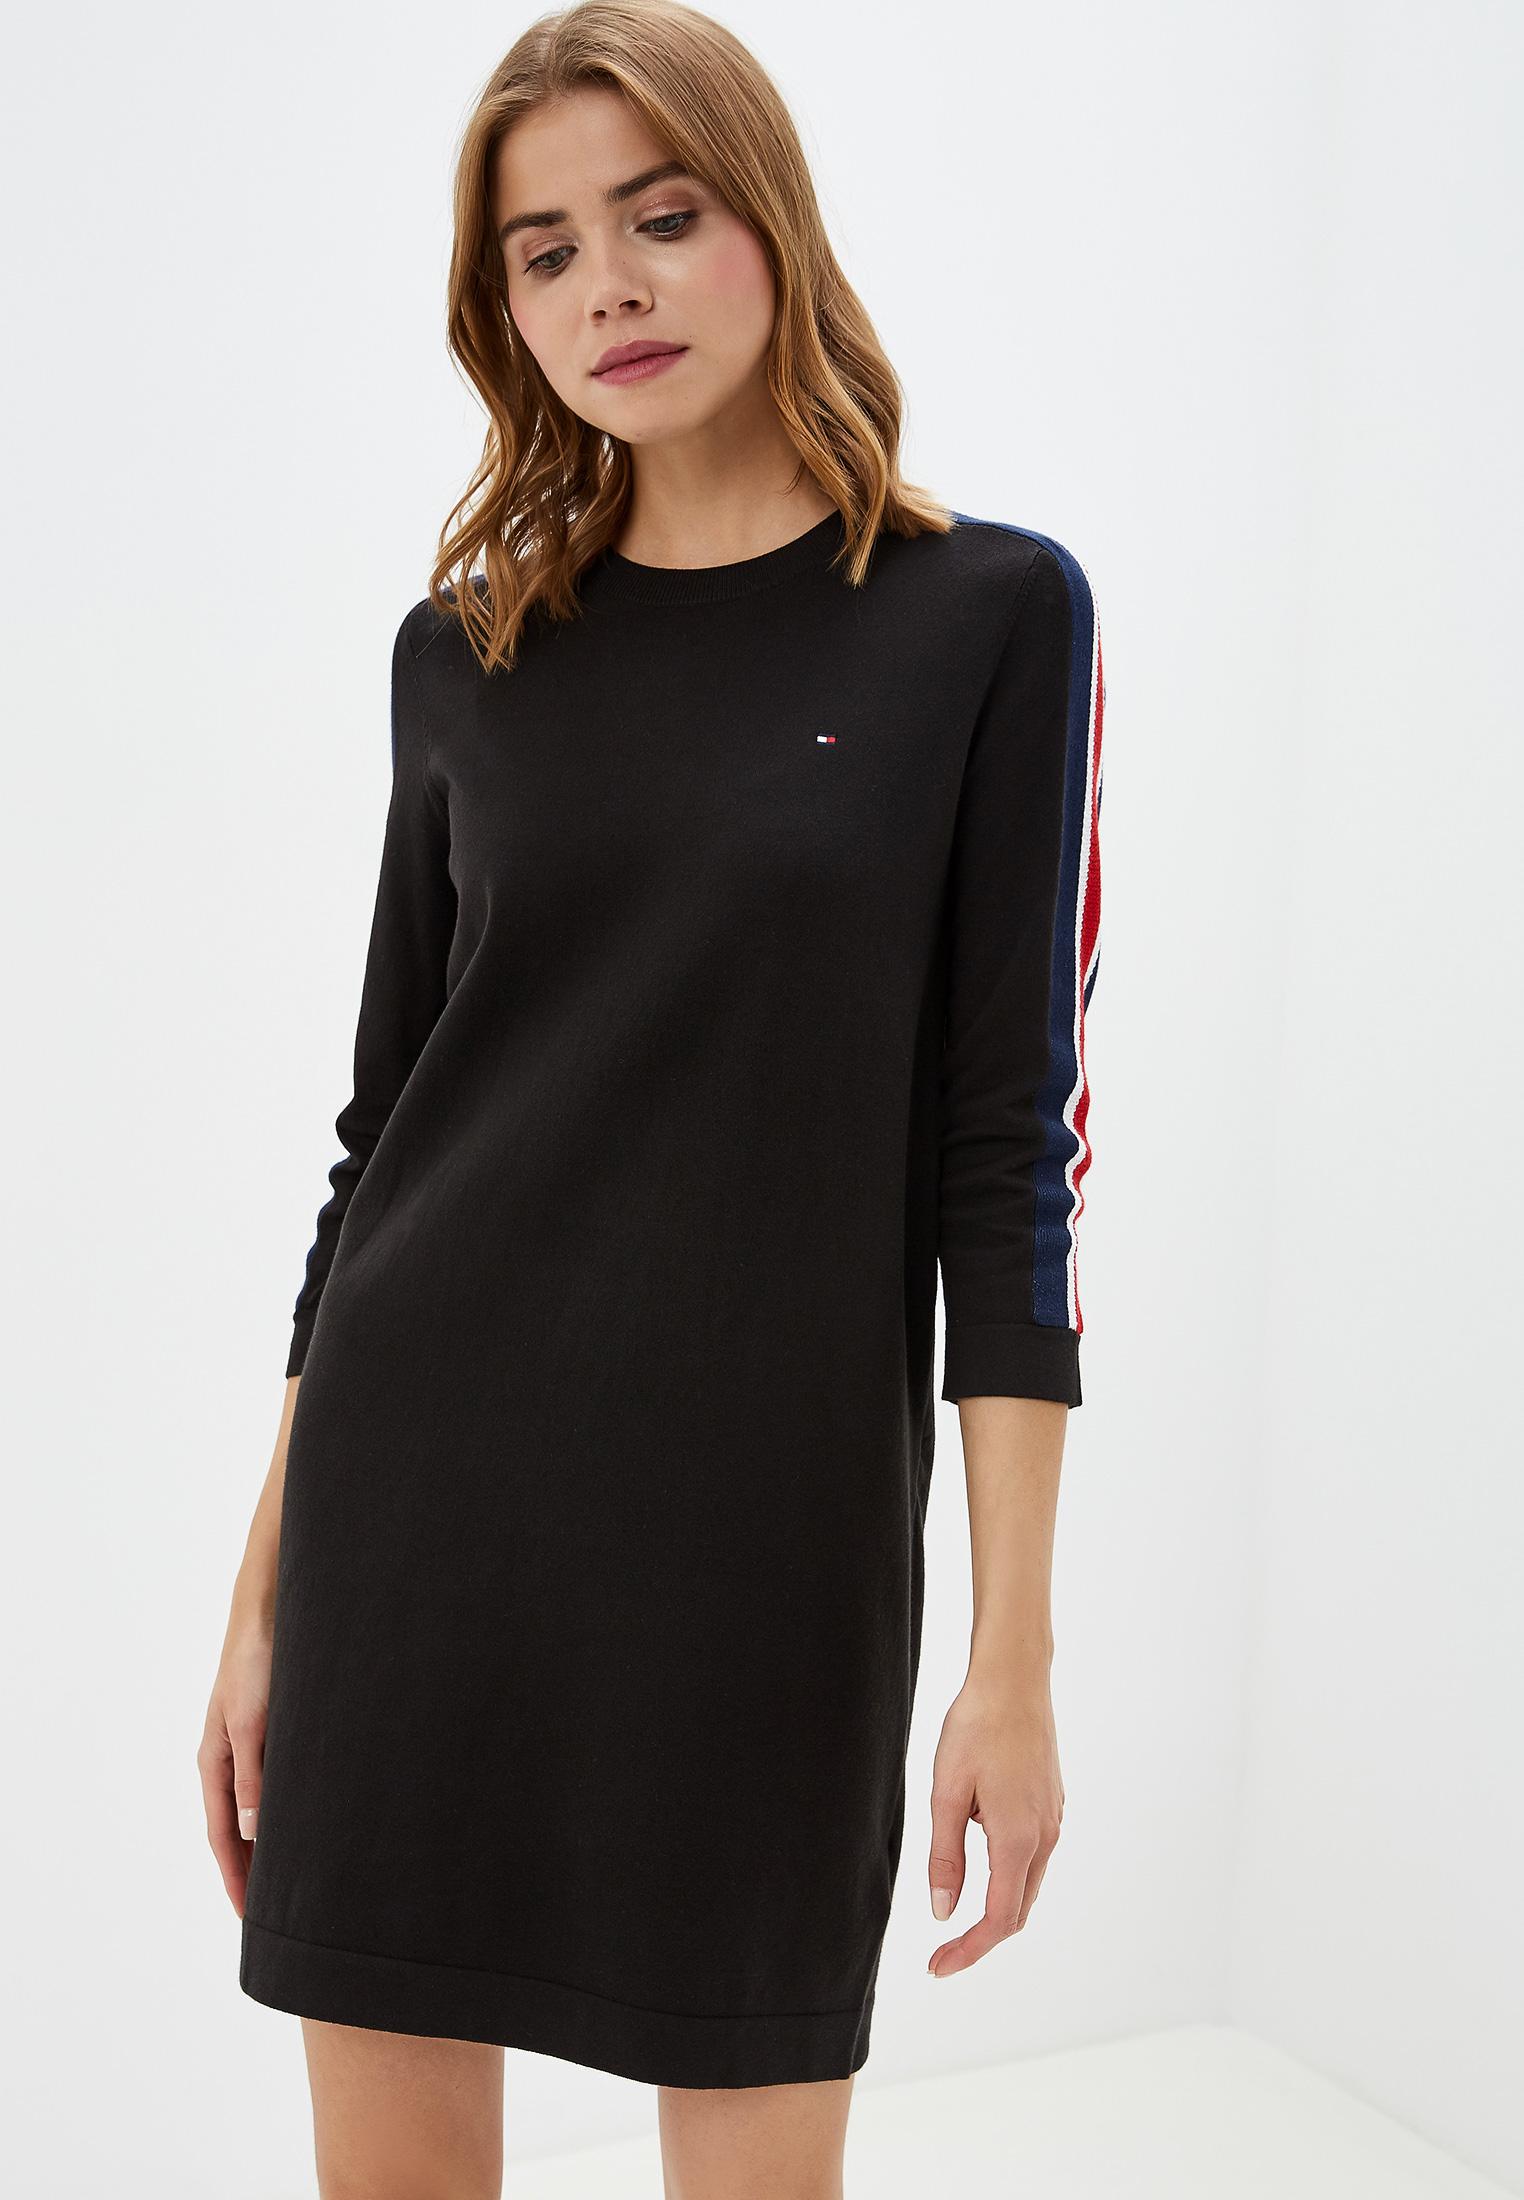 Платье Tommy Hilfiger (Томми Хилфигер) WW0WW26064